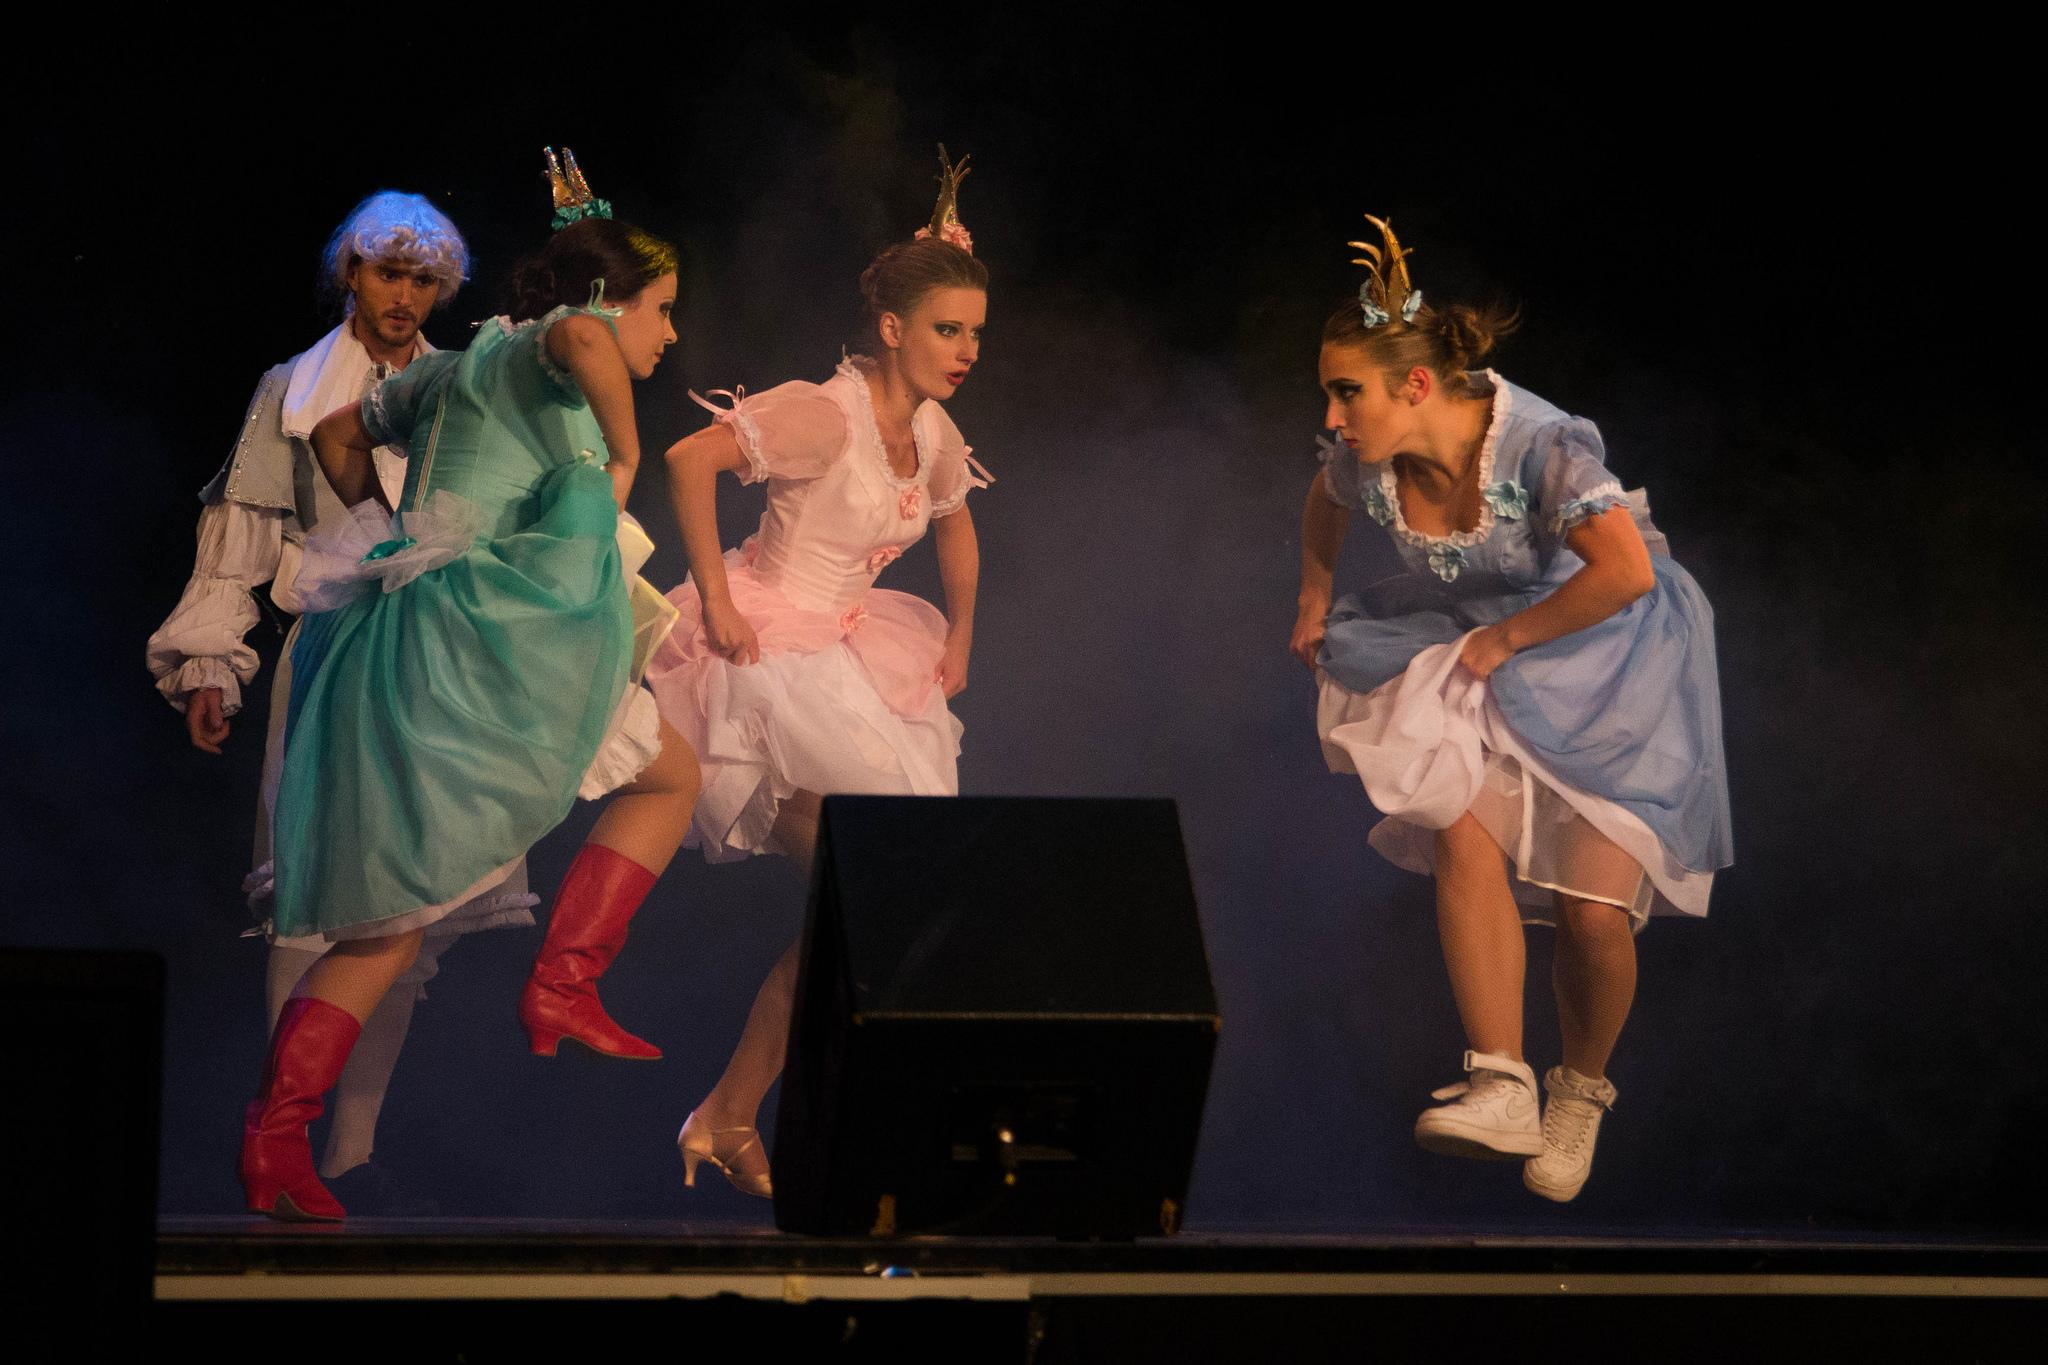 Historical Dance Cabaret